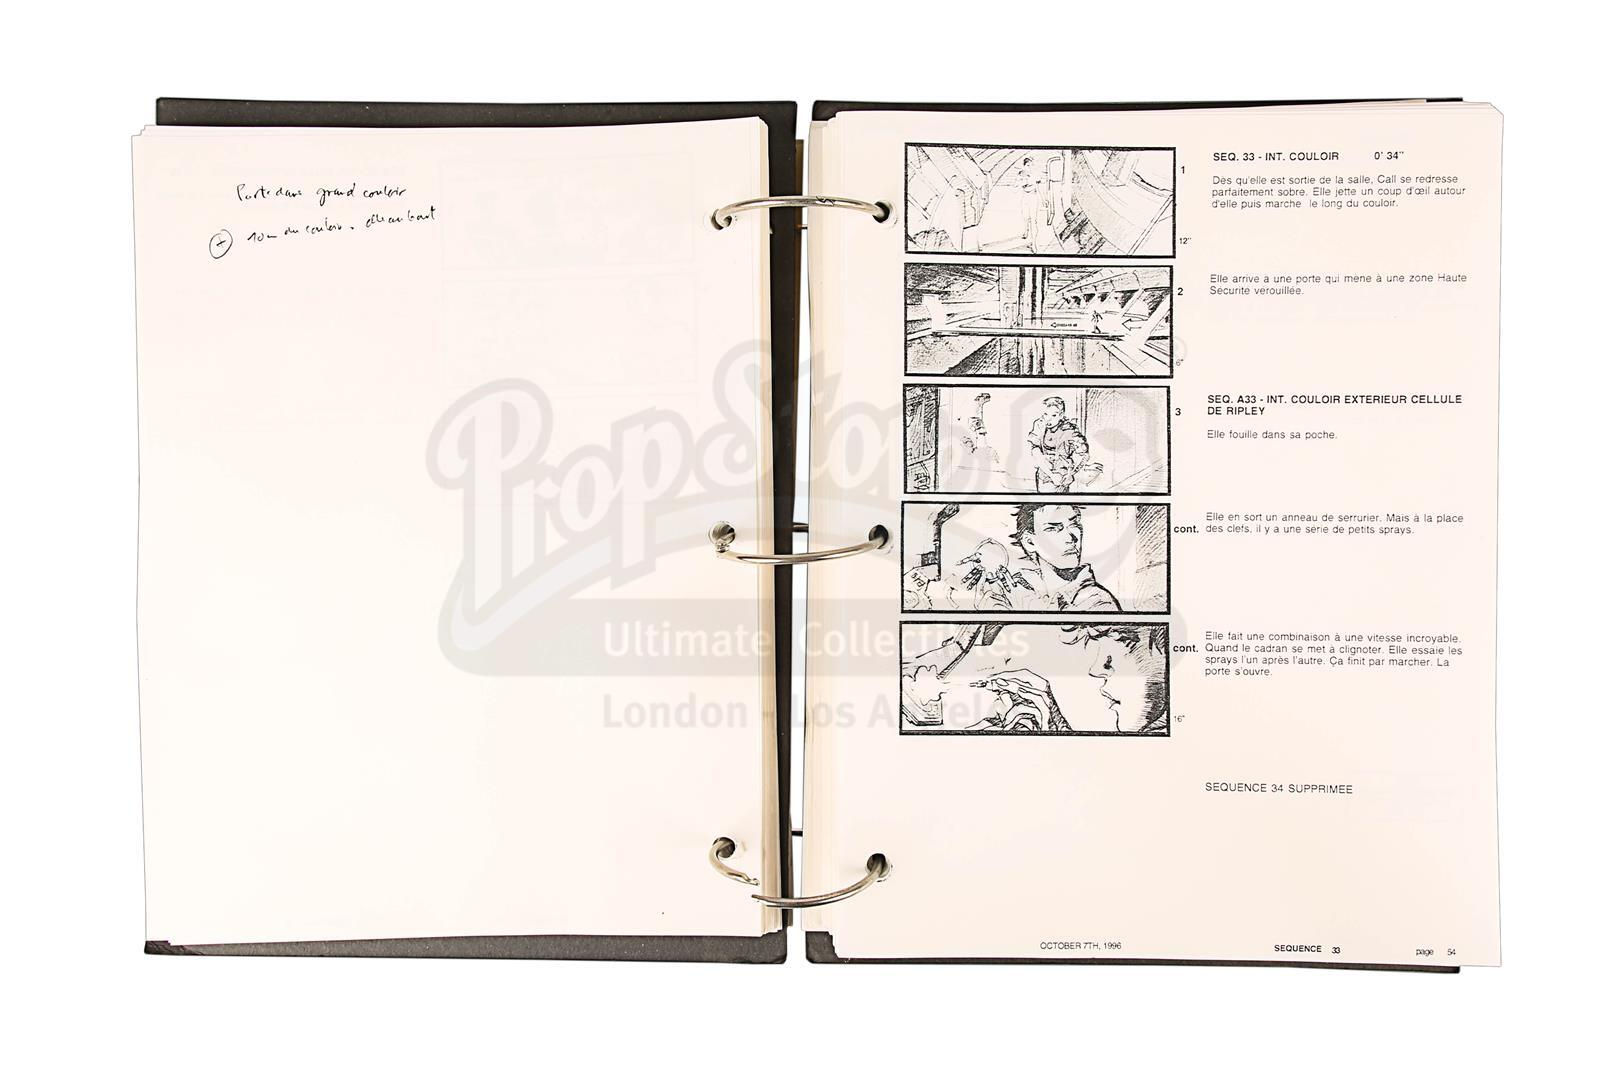 ALIEN RESURRECTION (1997) - Jean-Pierre Jeunet's Personal Storyboard Binder - Image 6 of 10